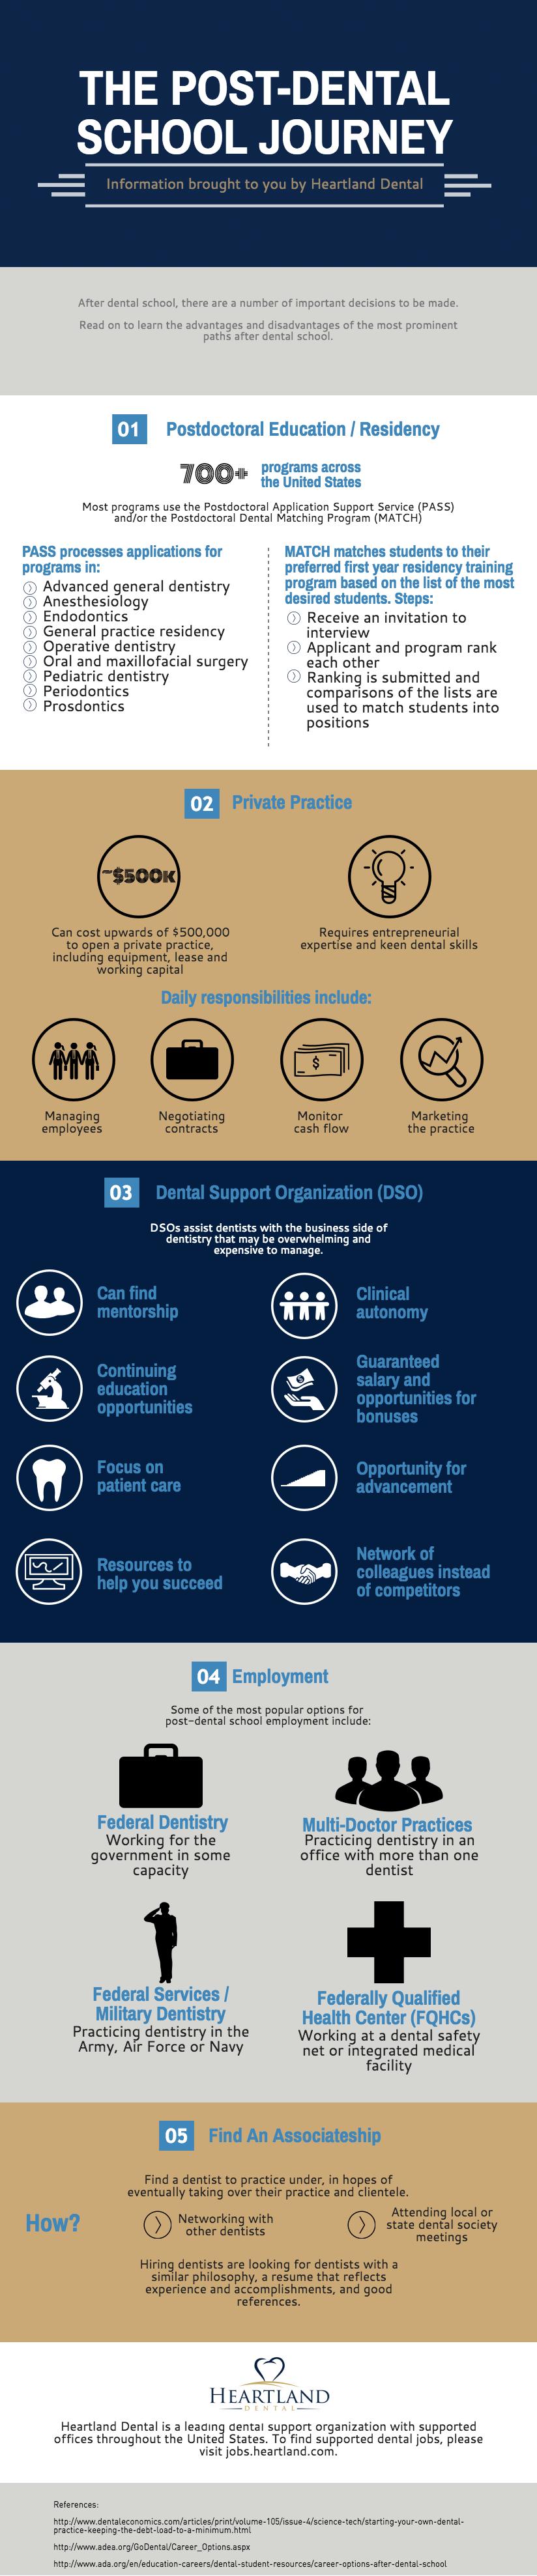 Post Dental School Journey